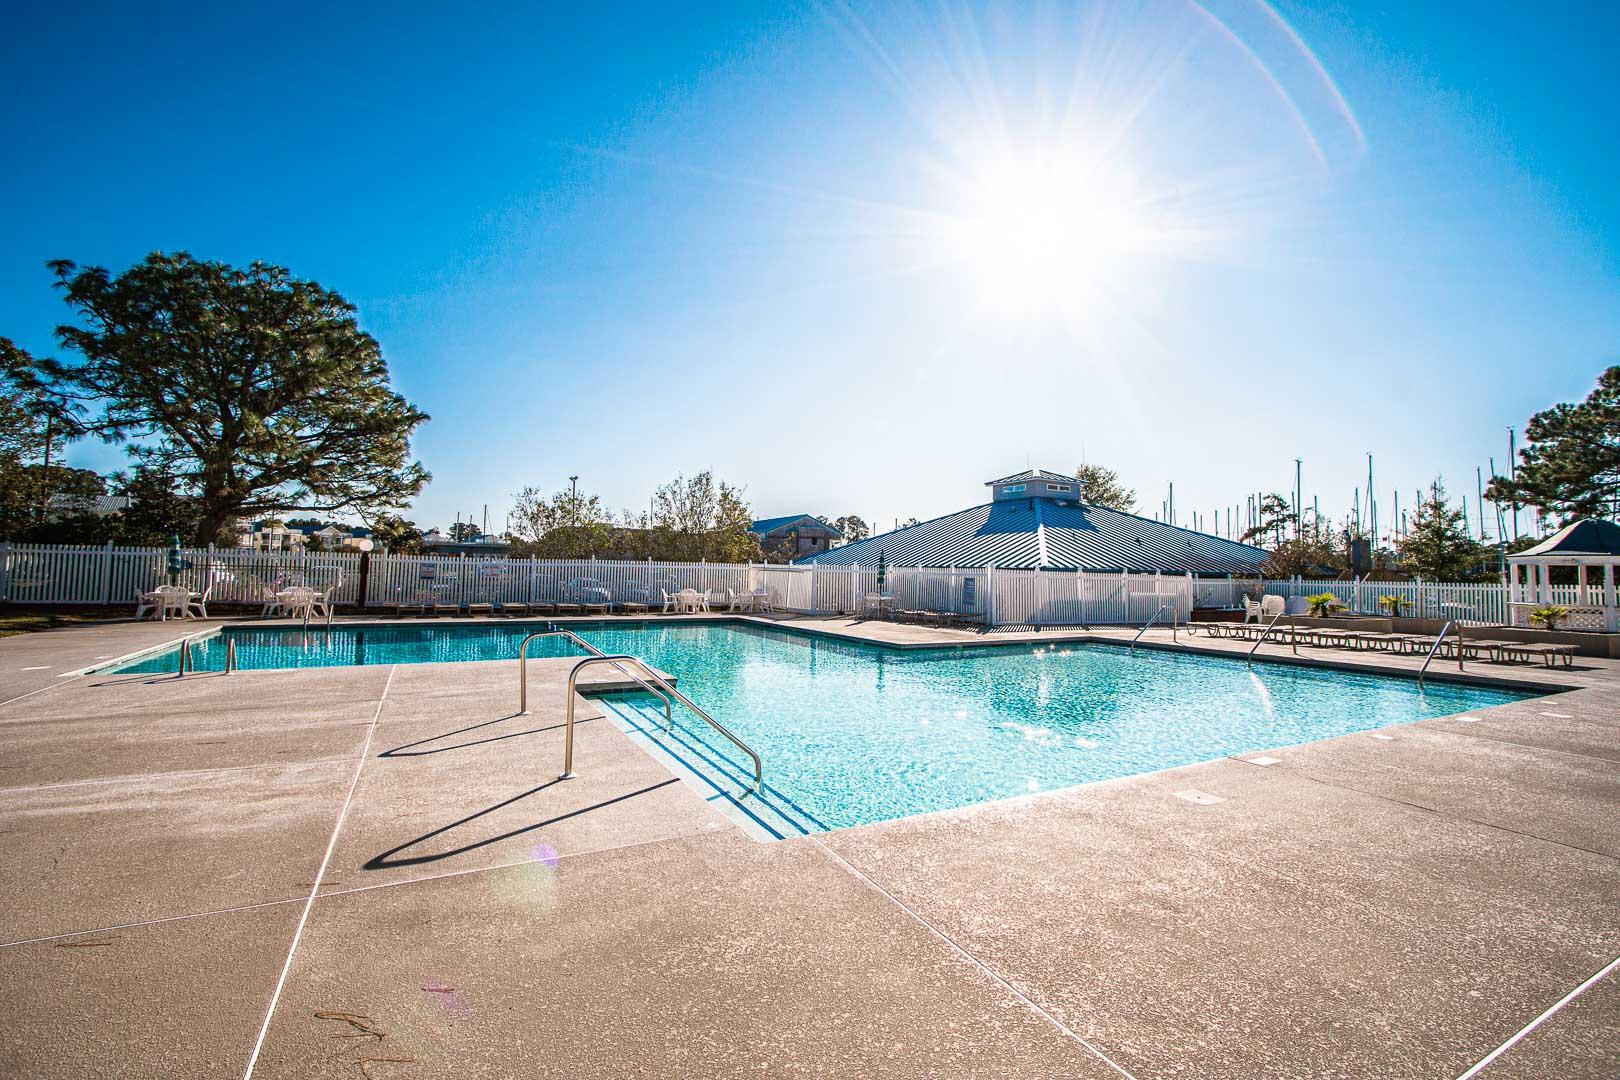 A crisp outdoor swimming pool at VRI's Sandcastle Village in New Bern, North Carolina.